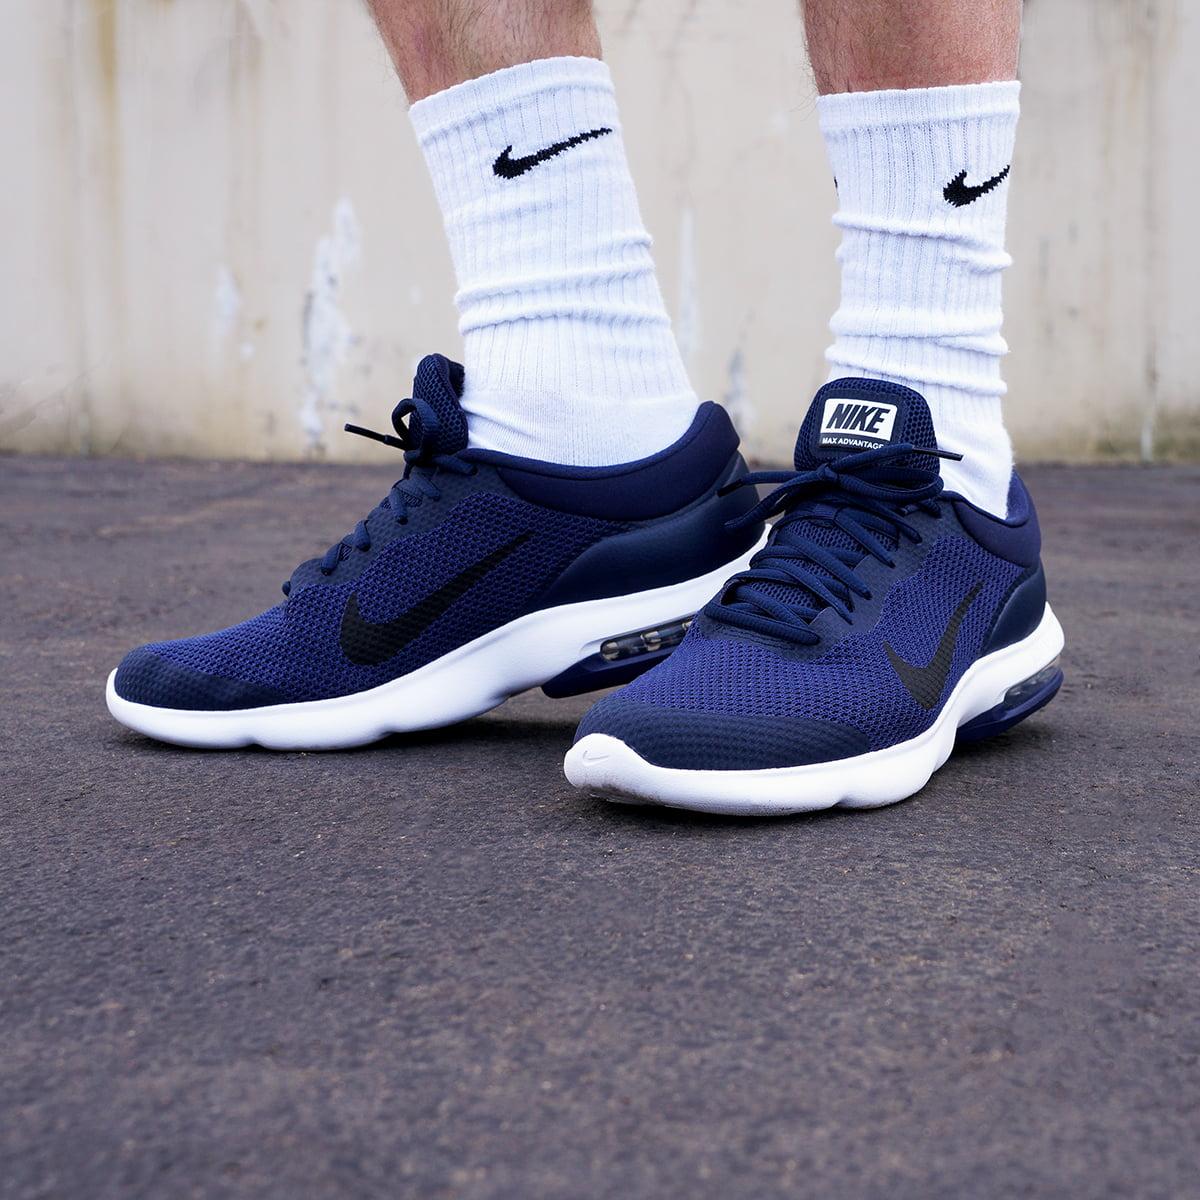 NIKE AIR MAX ADVANTAGE Mens Sneakers